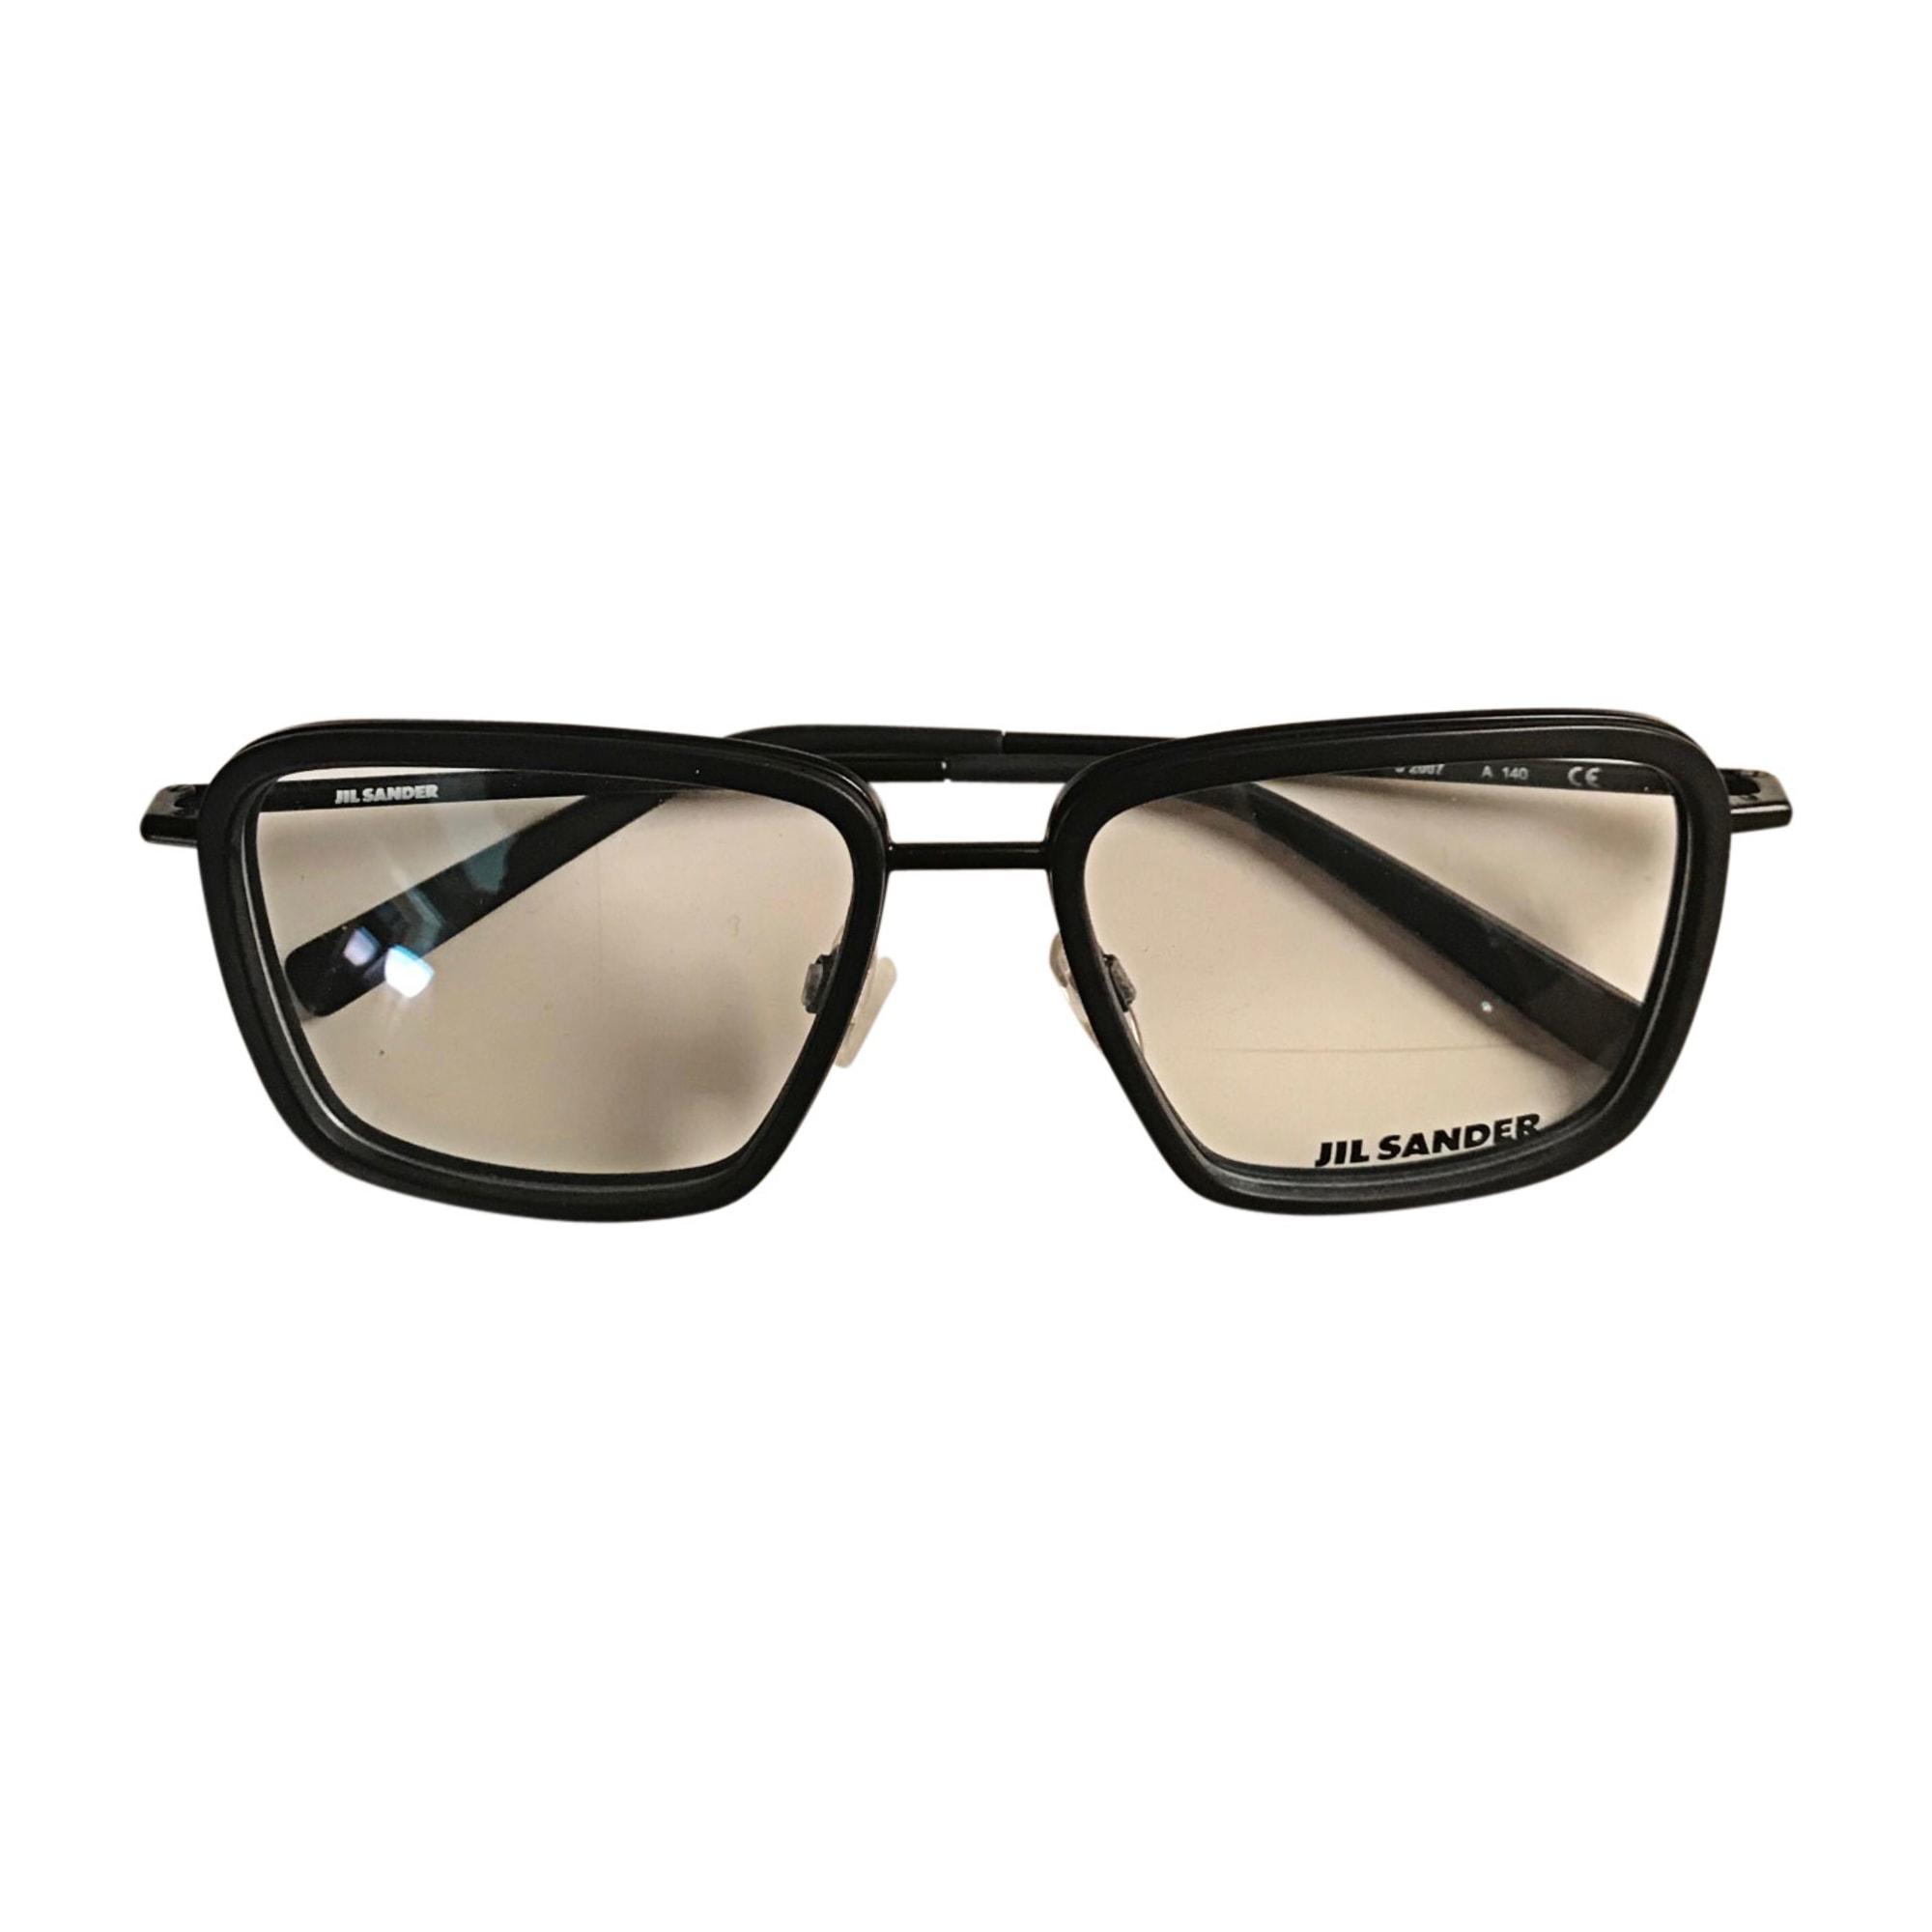 Eyeglass Frames JIL SANDER Black